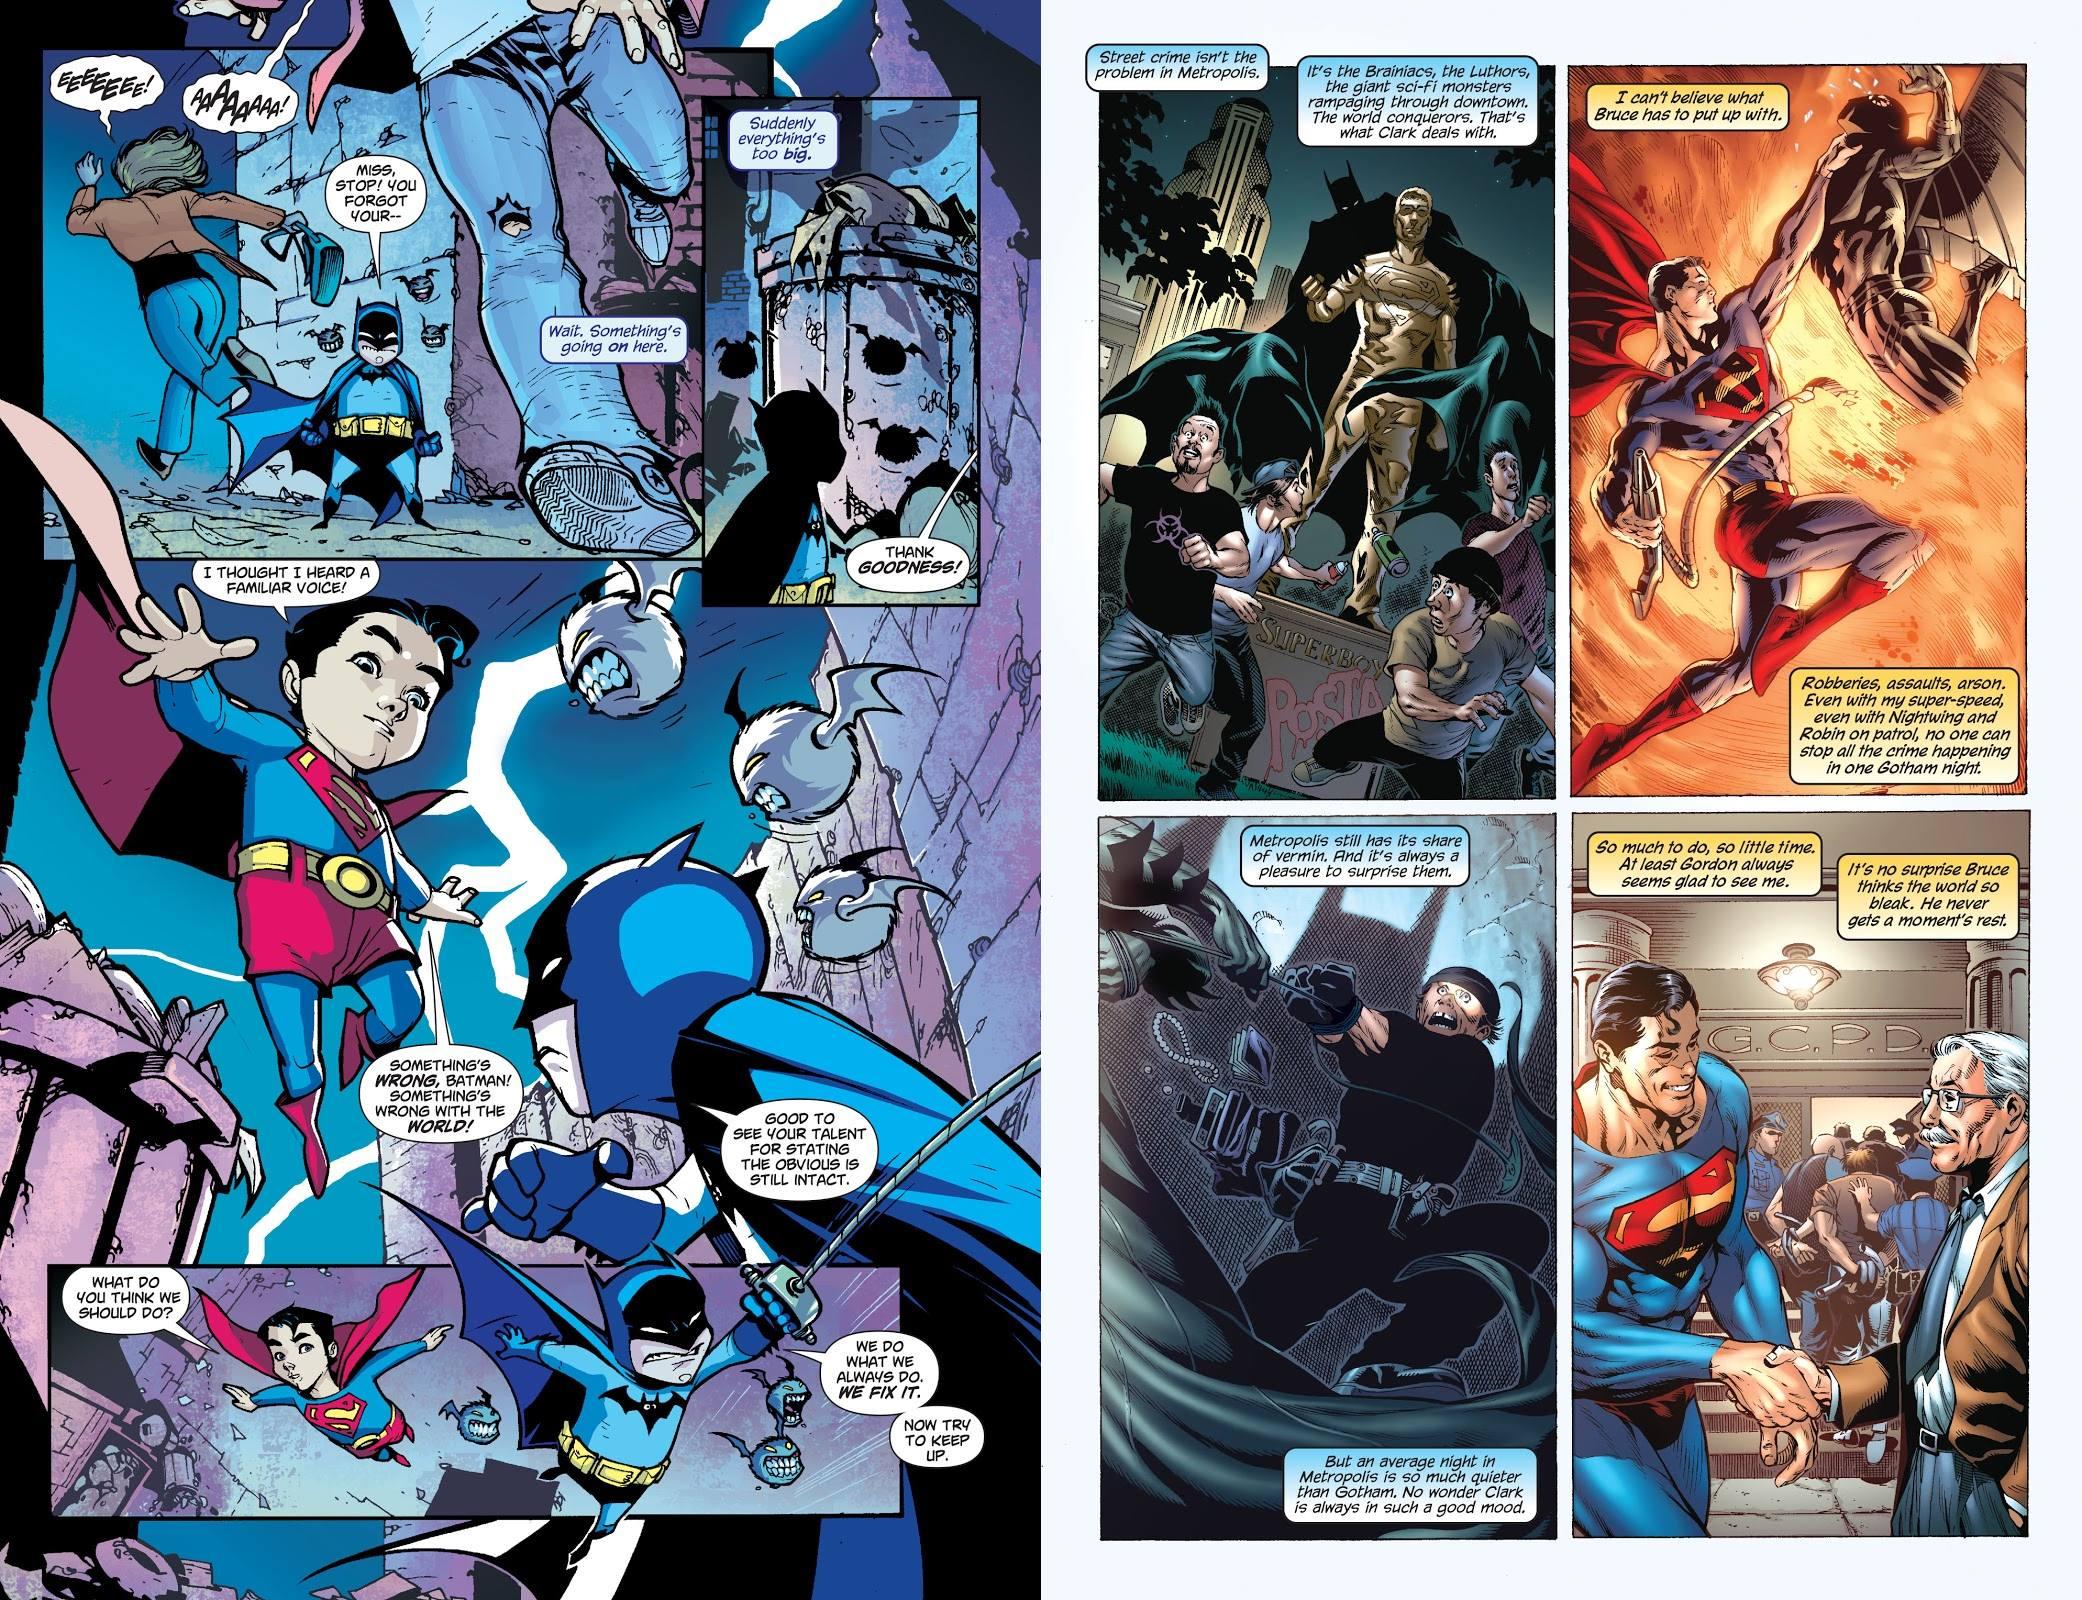 Superman Batman Finest Worlds review